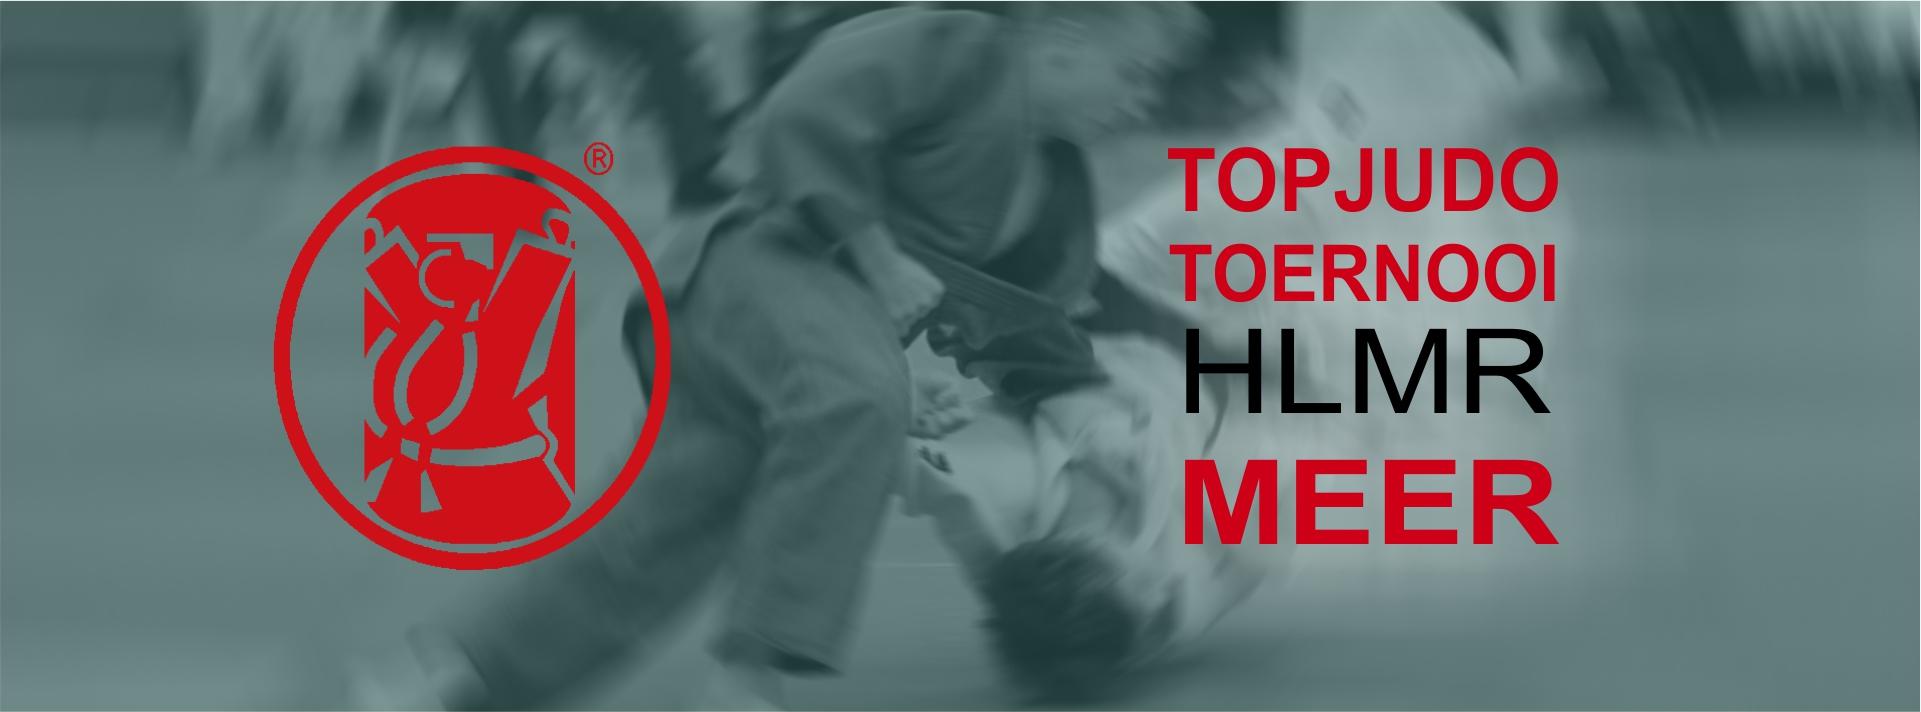 Topjudo Toernooi Haarlemmermeer georganiseerd door Judo Yushi